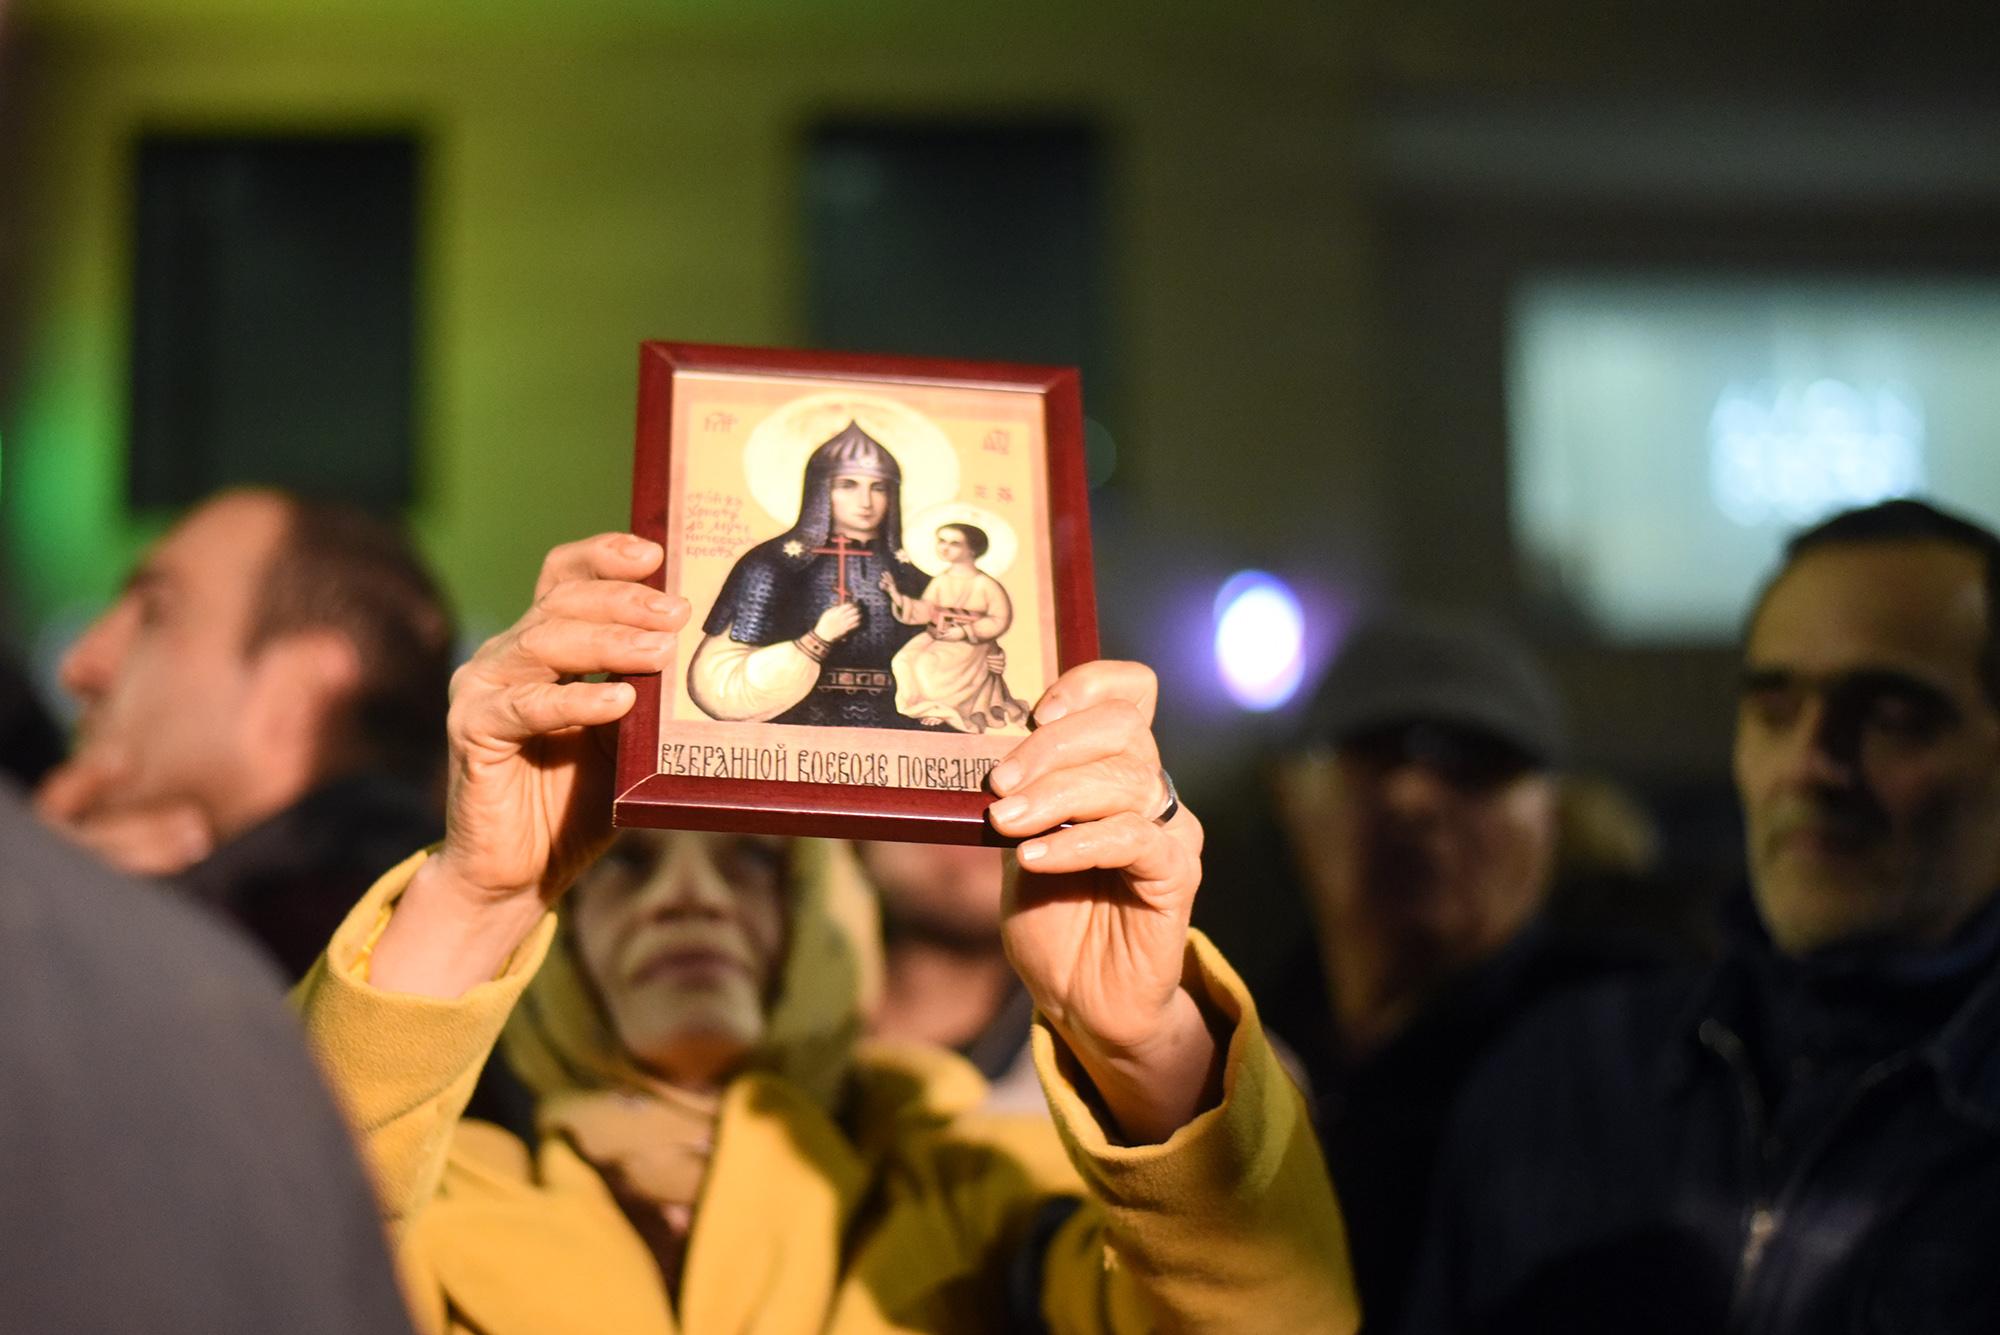 Участница протеста держит икону. Фото: Мари Никурадзе/OC Media